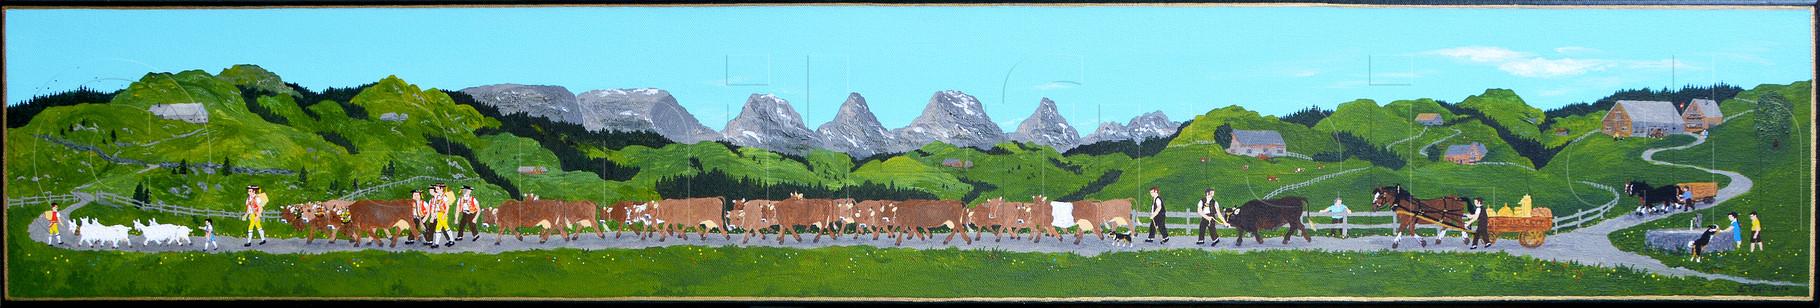 20 x 120 cm, Acryl auf Leinwand, 2014